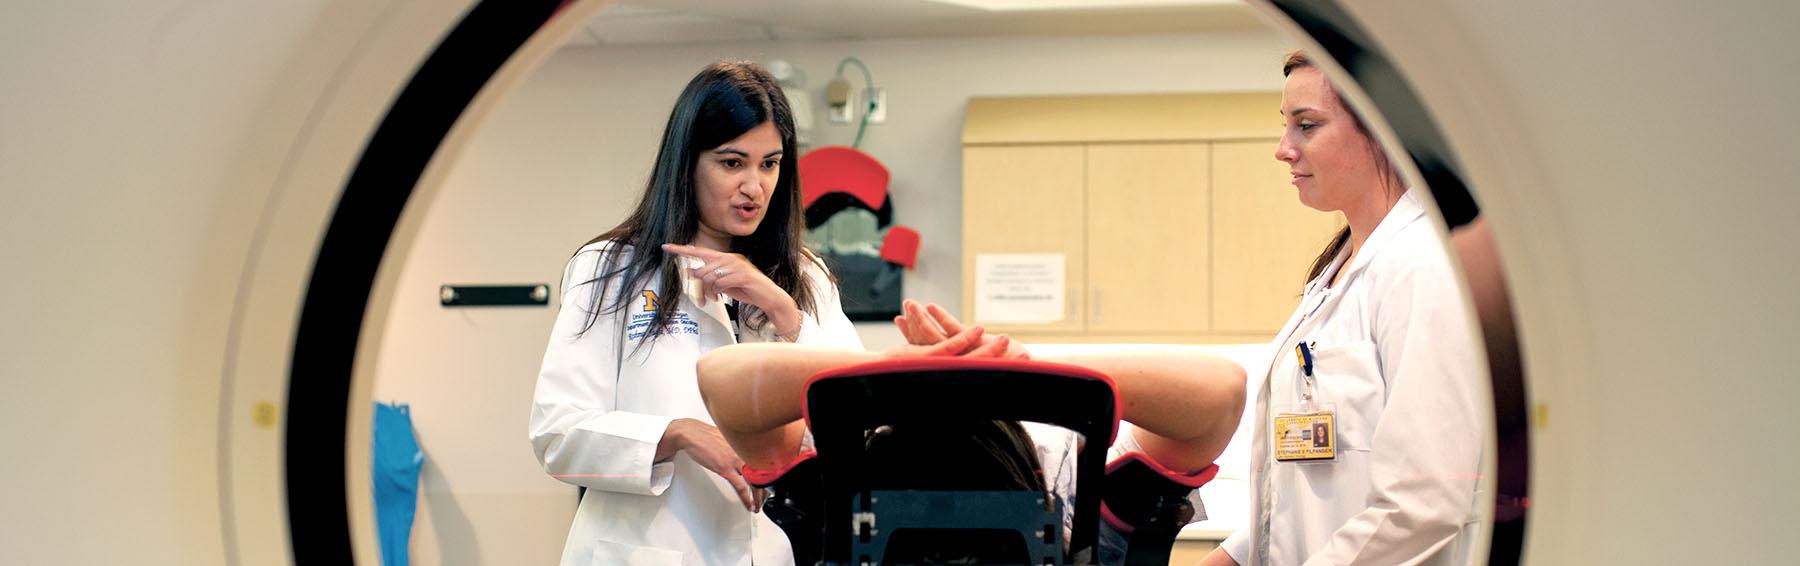 Reshma Jagsi in clinic